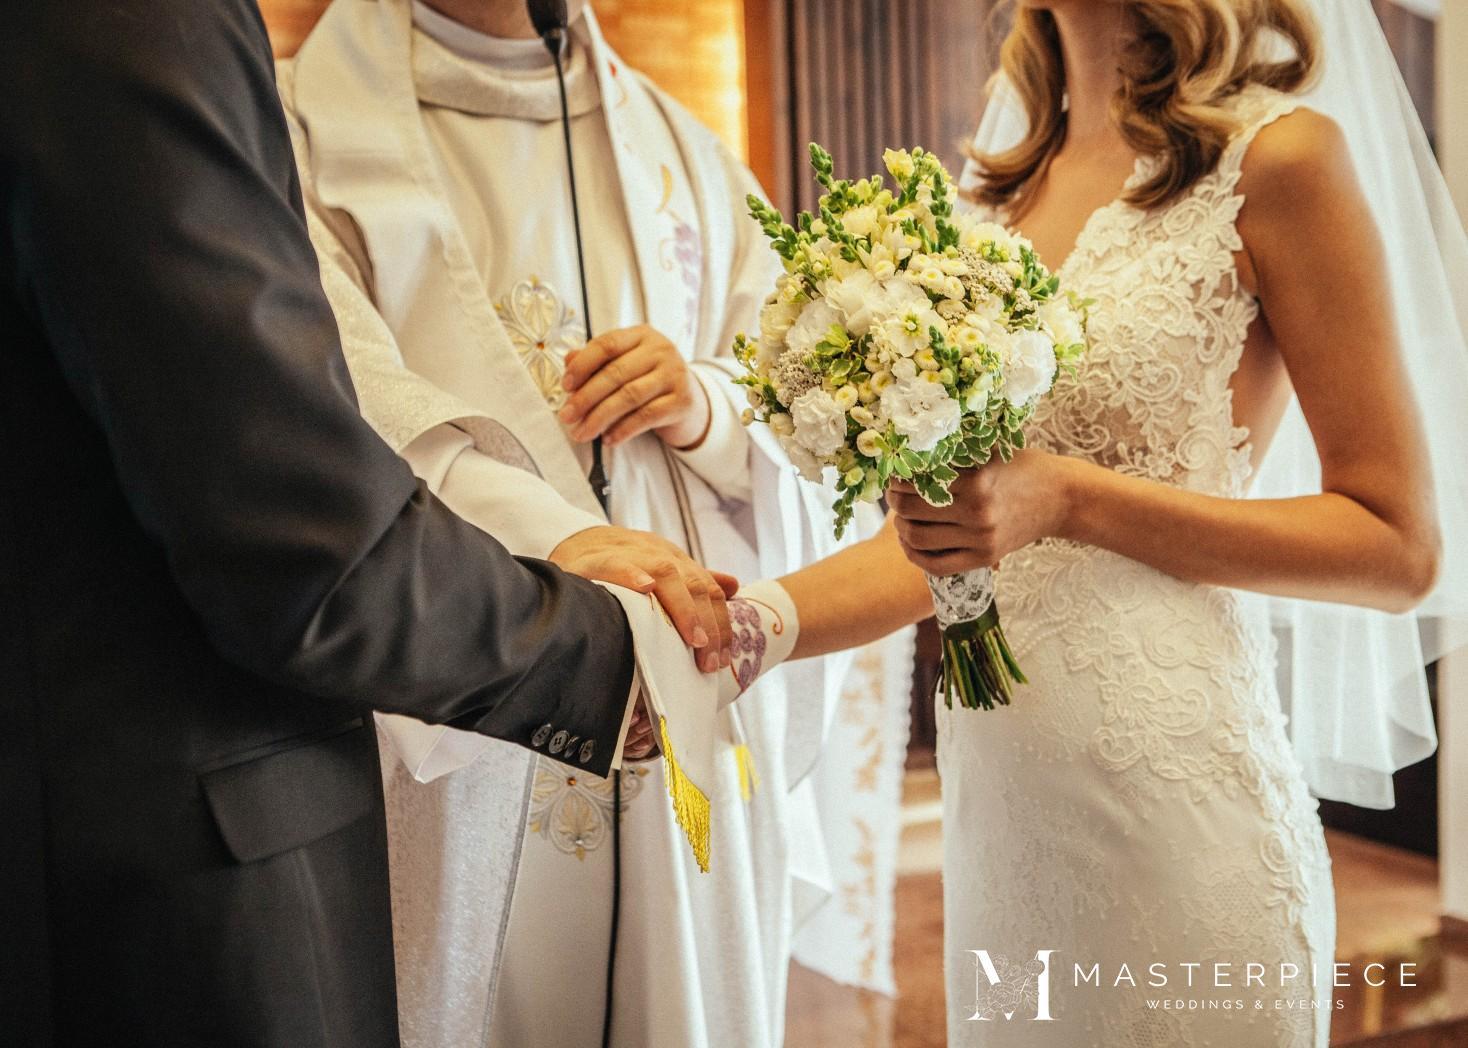 Masterpiece_Weddings_sluby_063